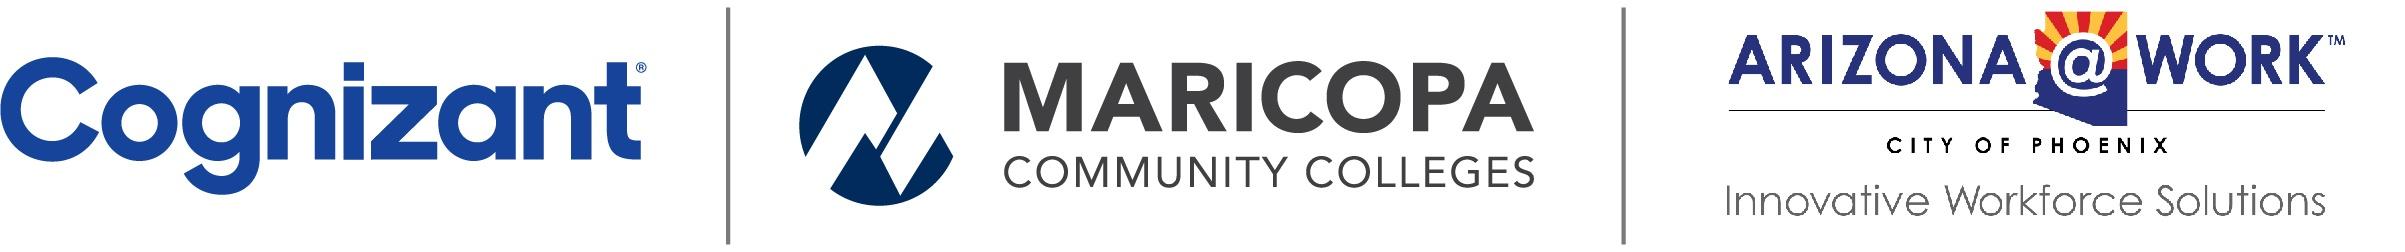 Cognizant - Maricopa - AZ@Work- 3 Logo